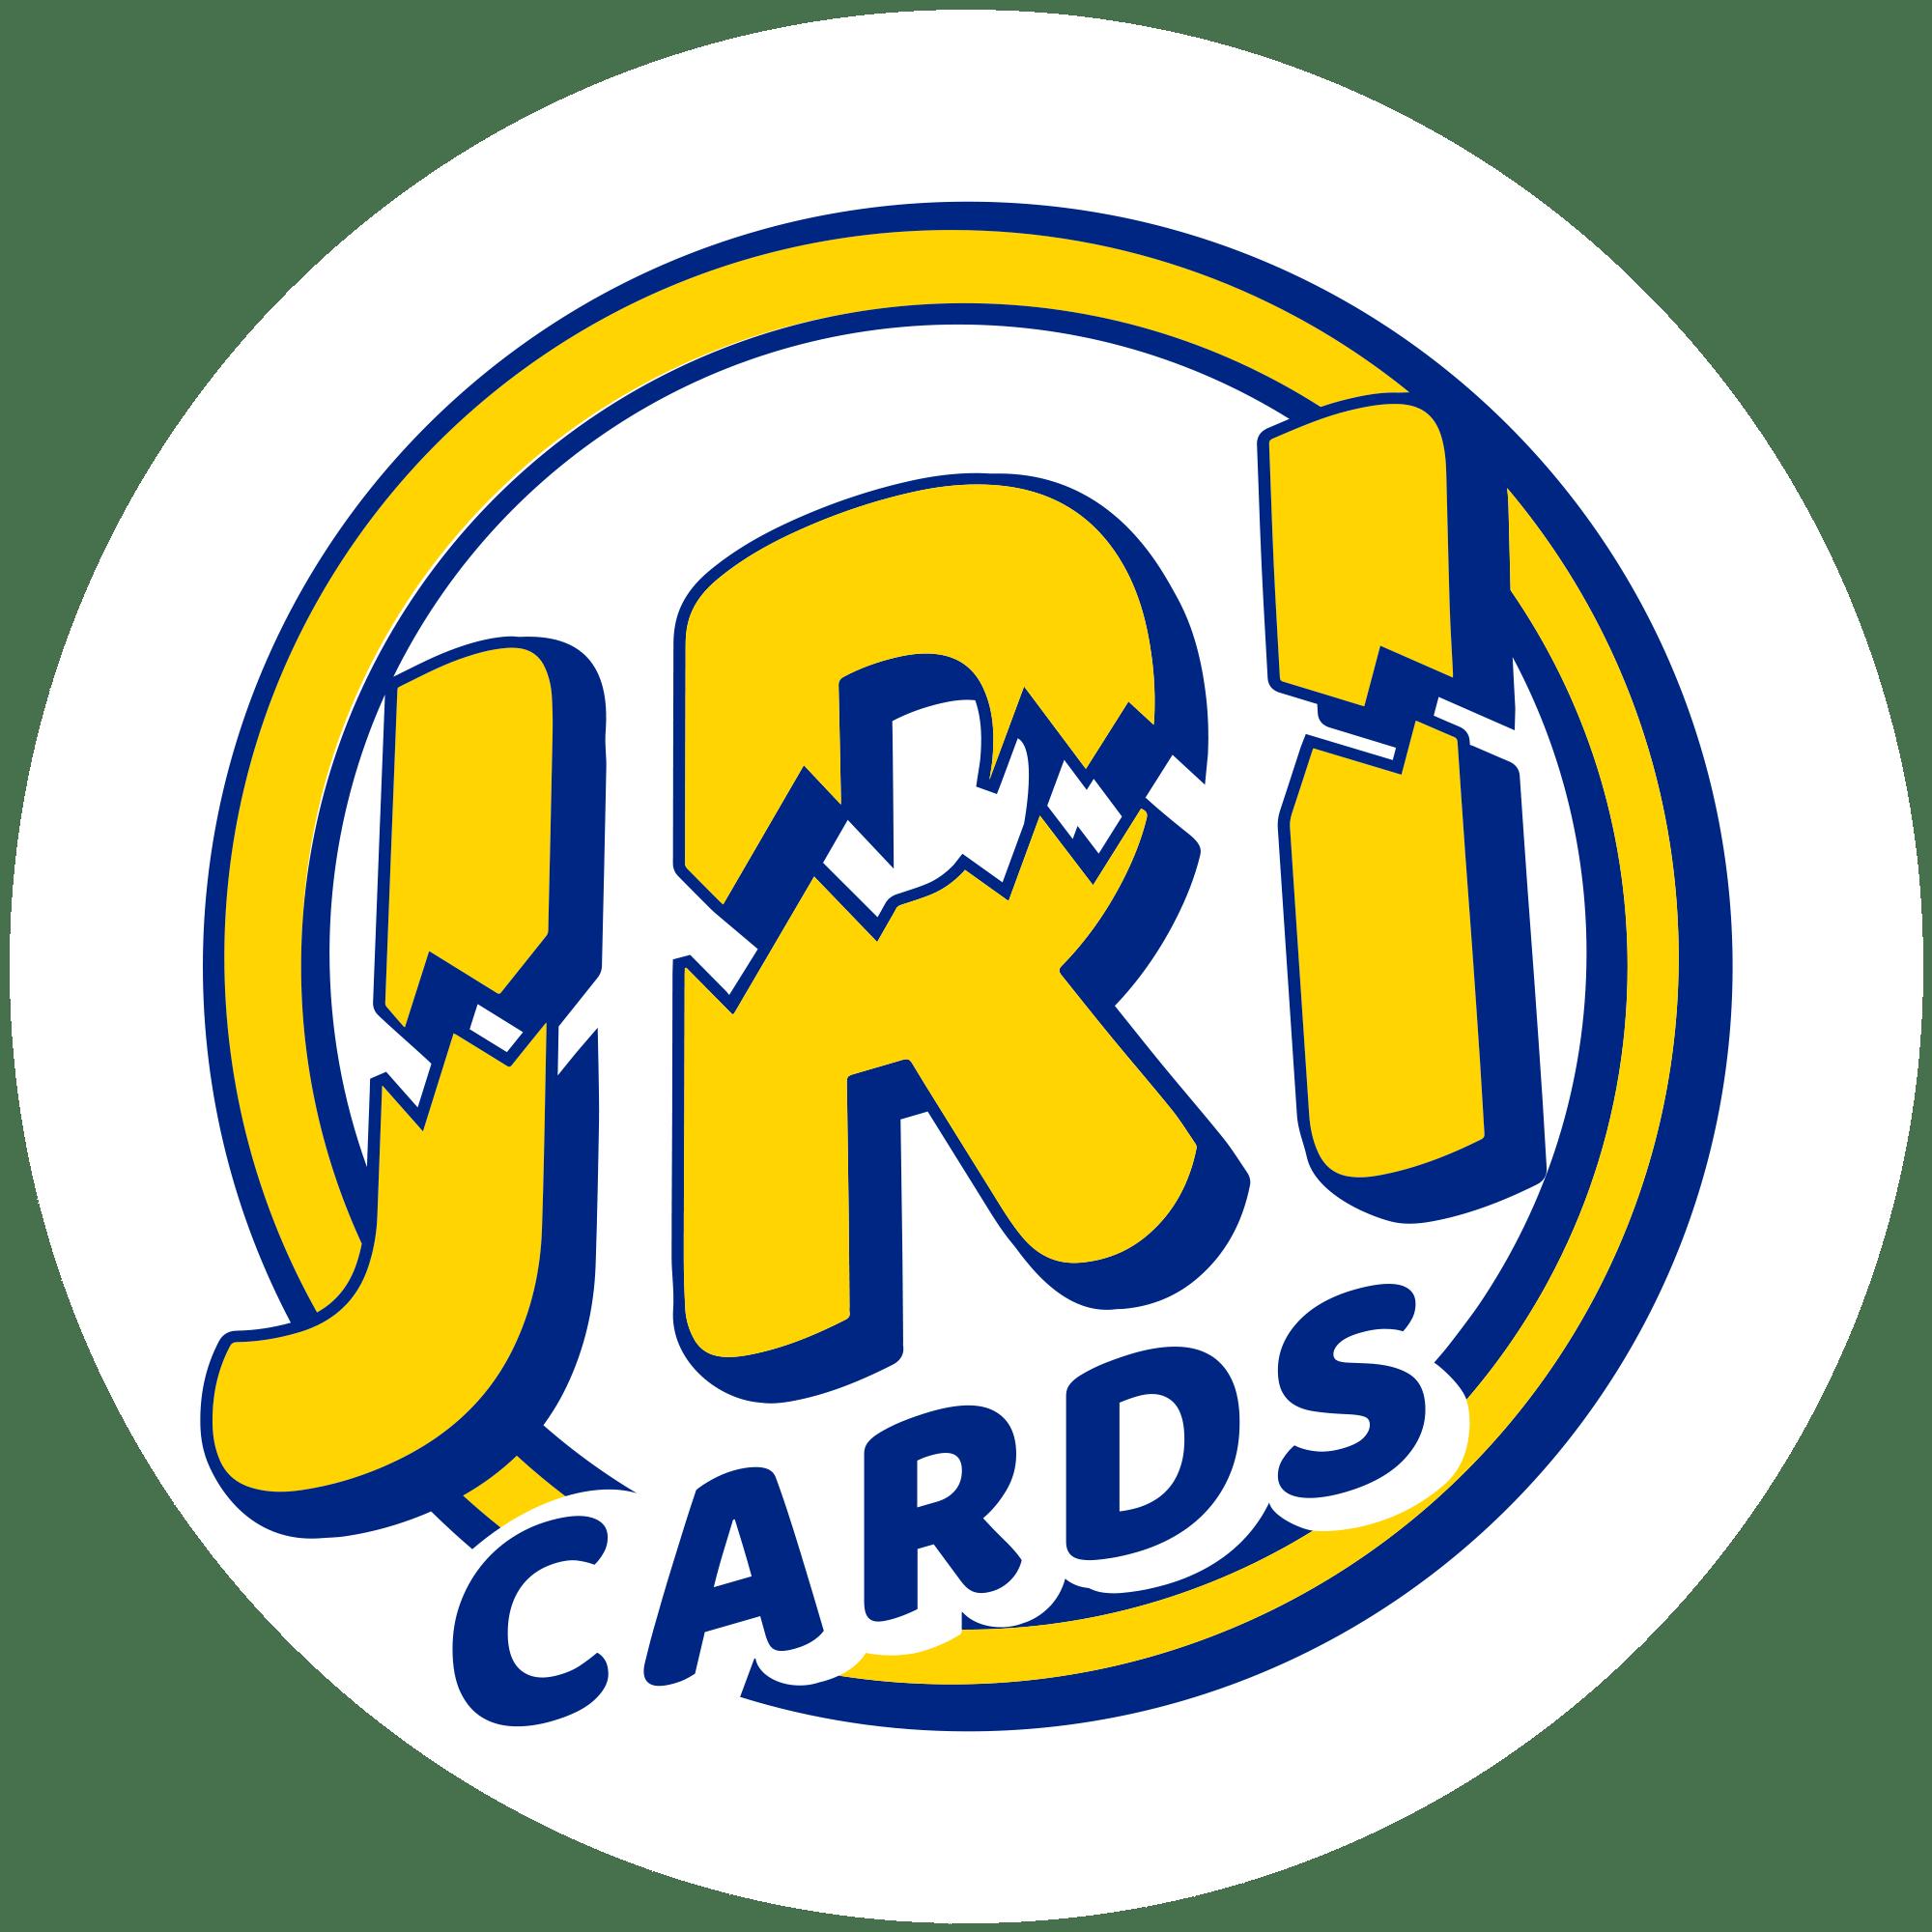 2019 PANINI CONTENDERS DRAFT PICKS BASKETBALL (6 PACKS AVAILABLE)